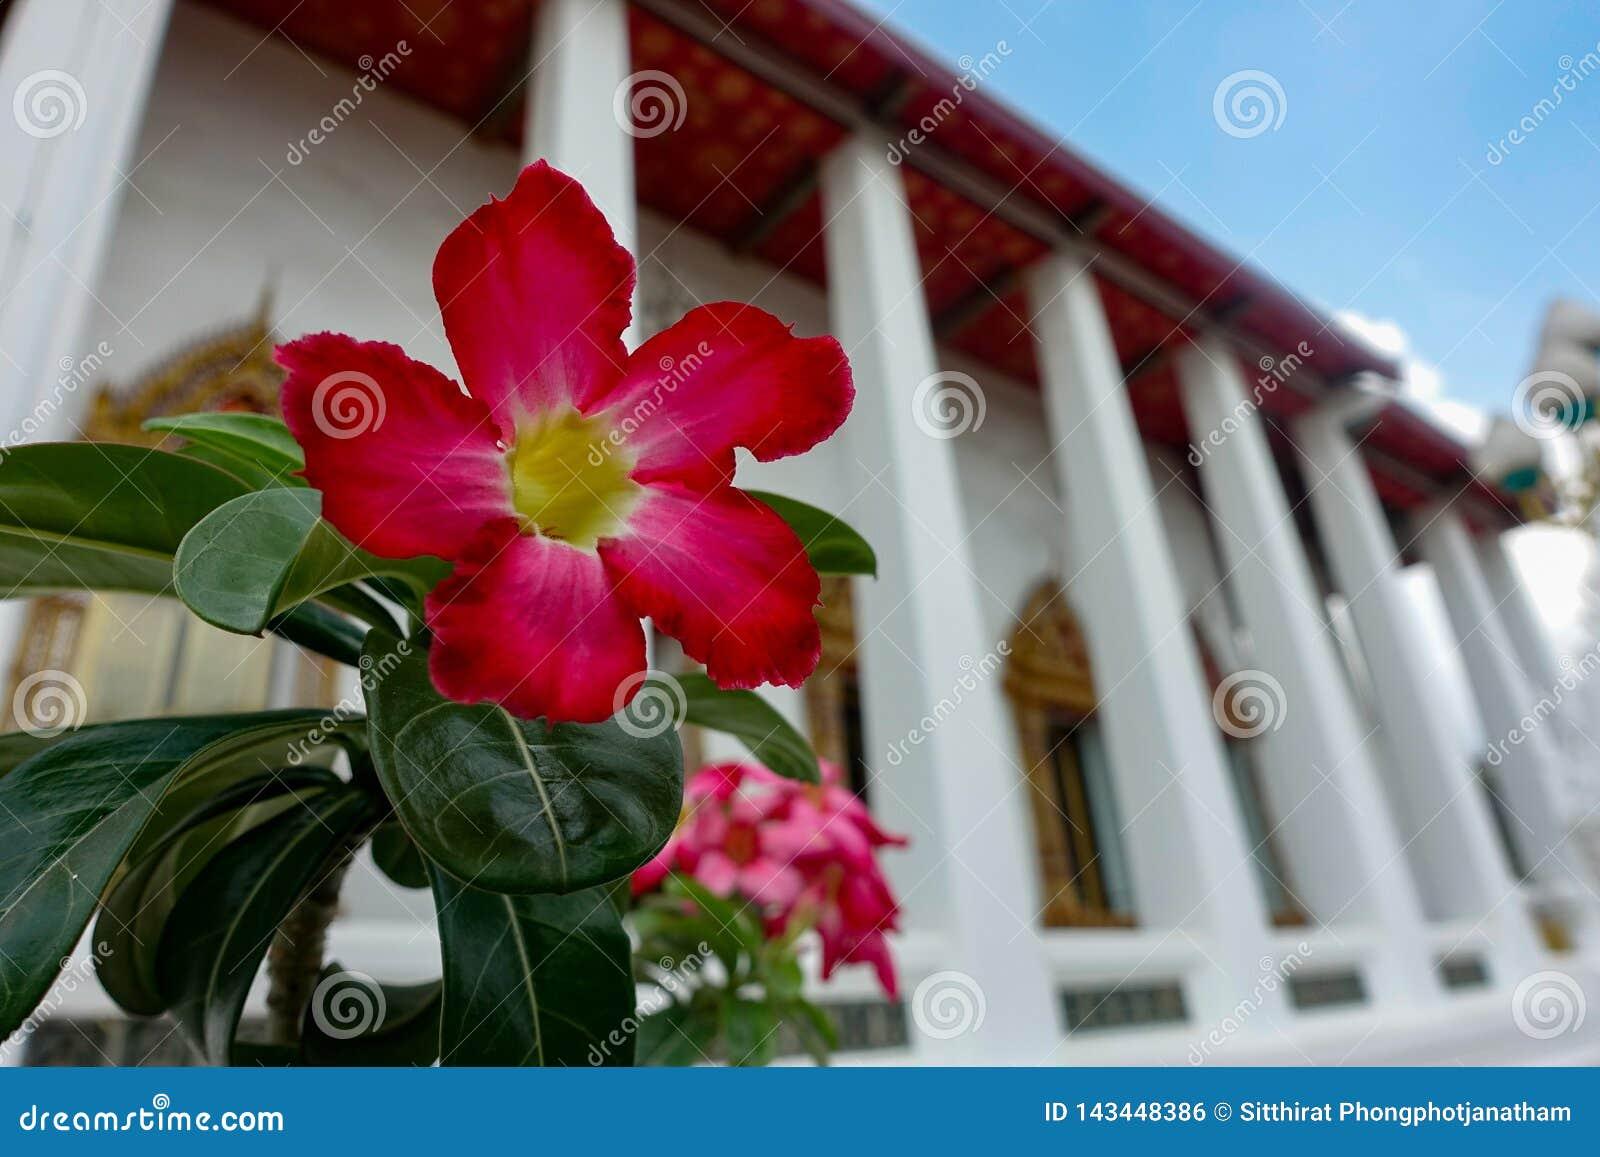 Nahe oben rote Petunie im Tempel